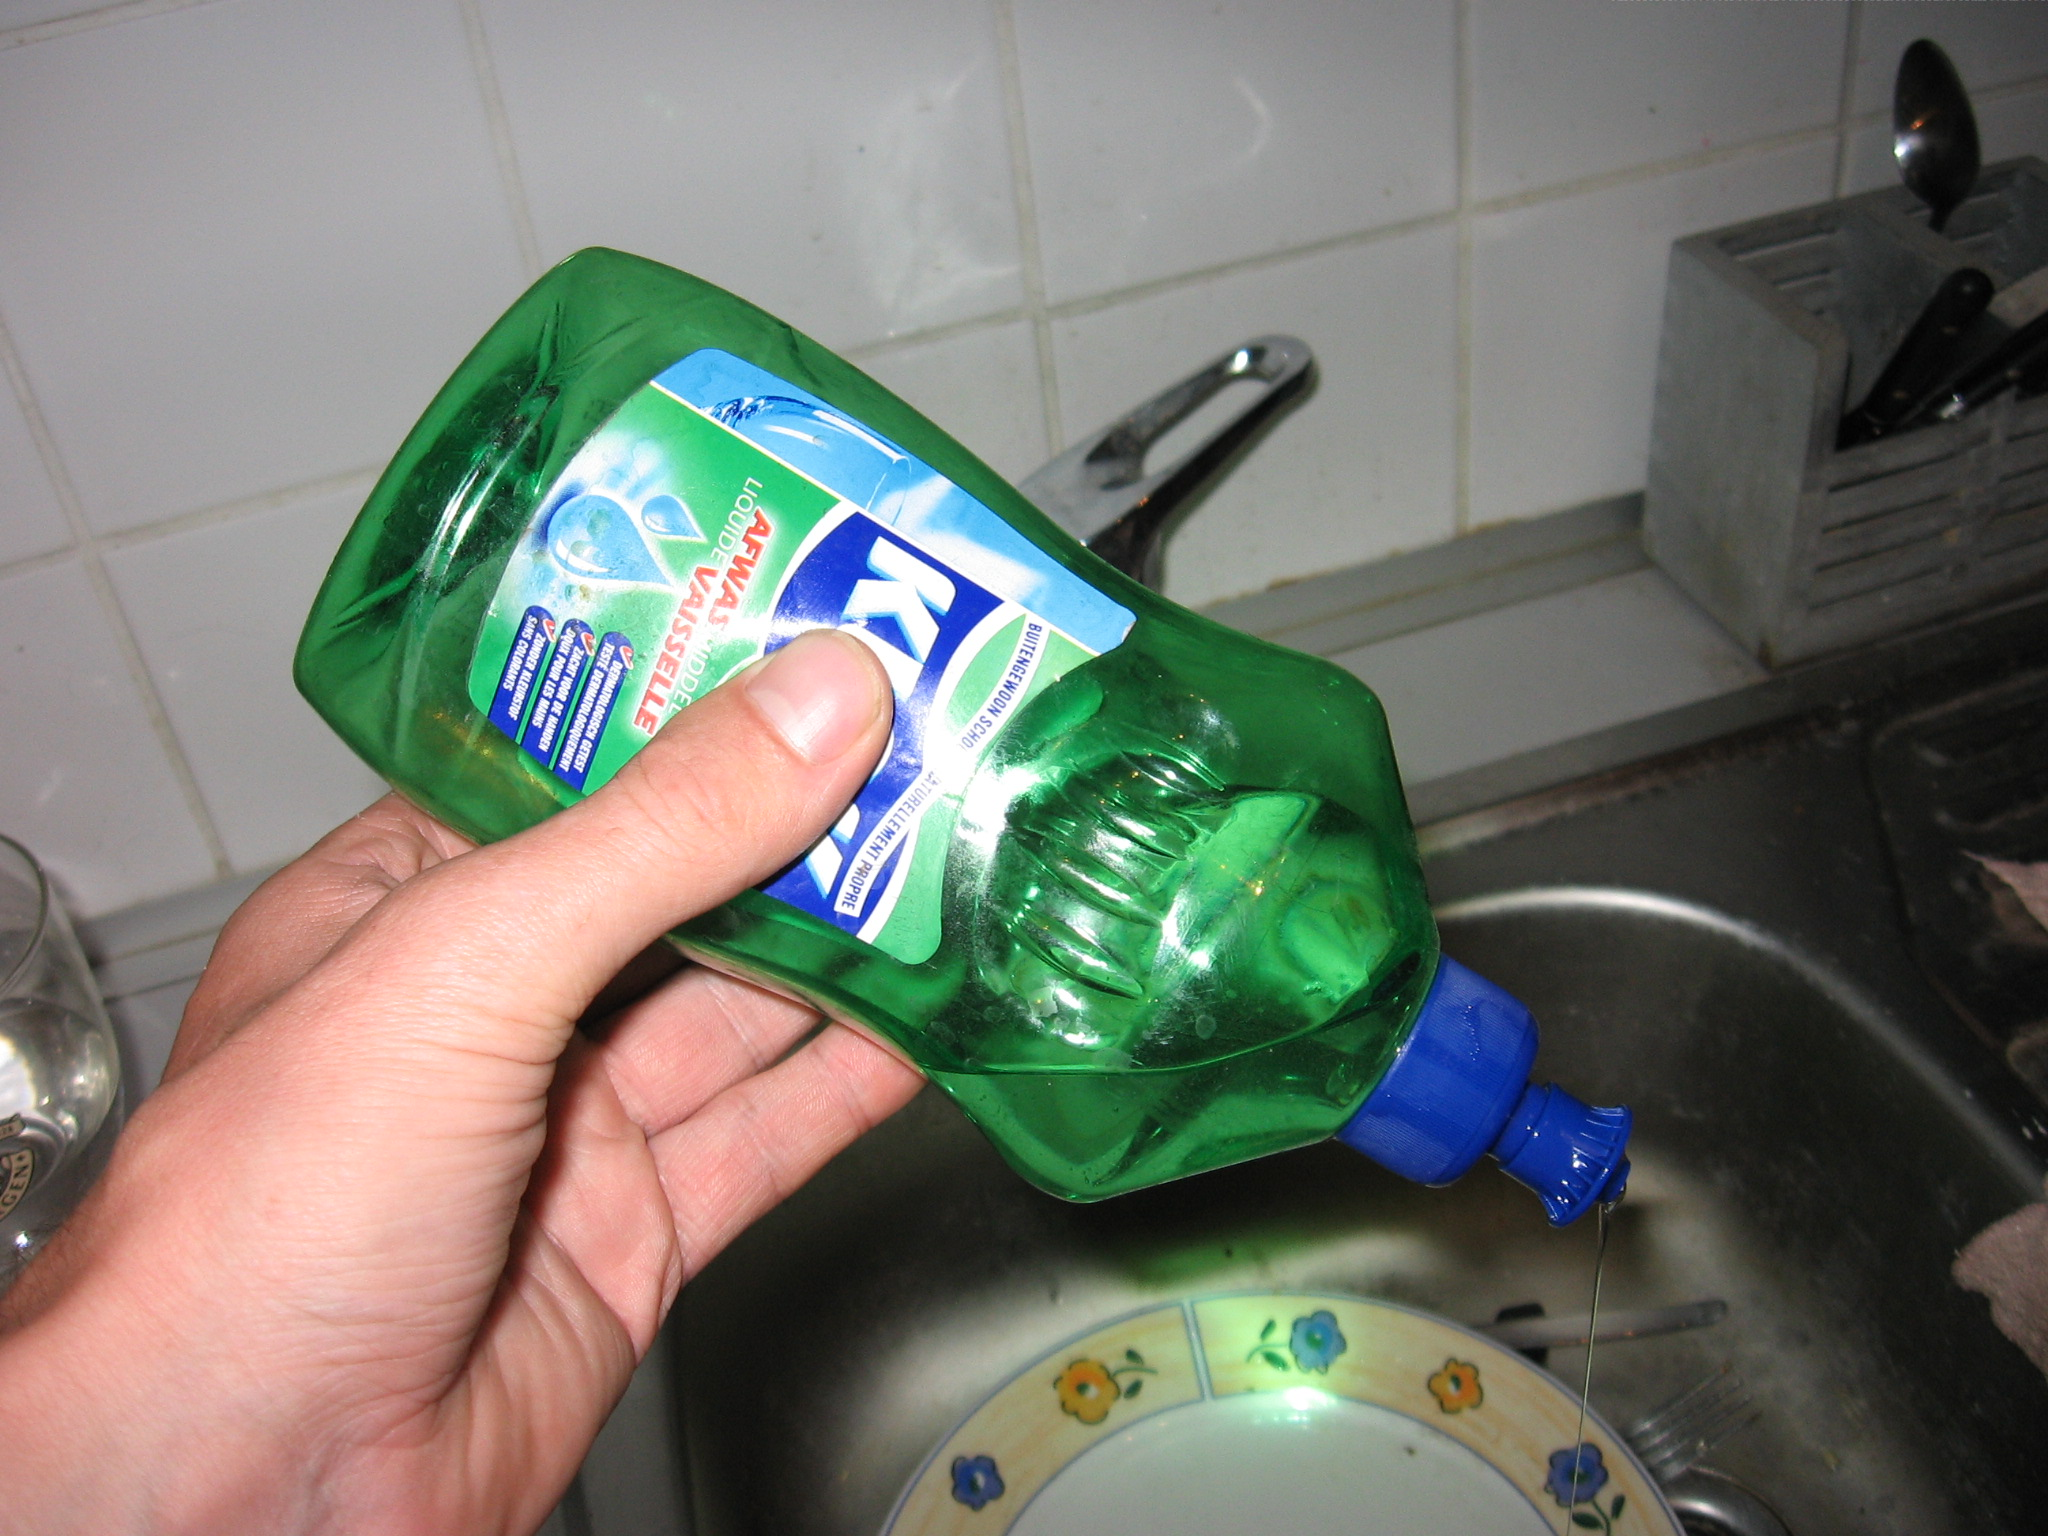 Dishwashing liquid - Wikipedia